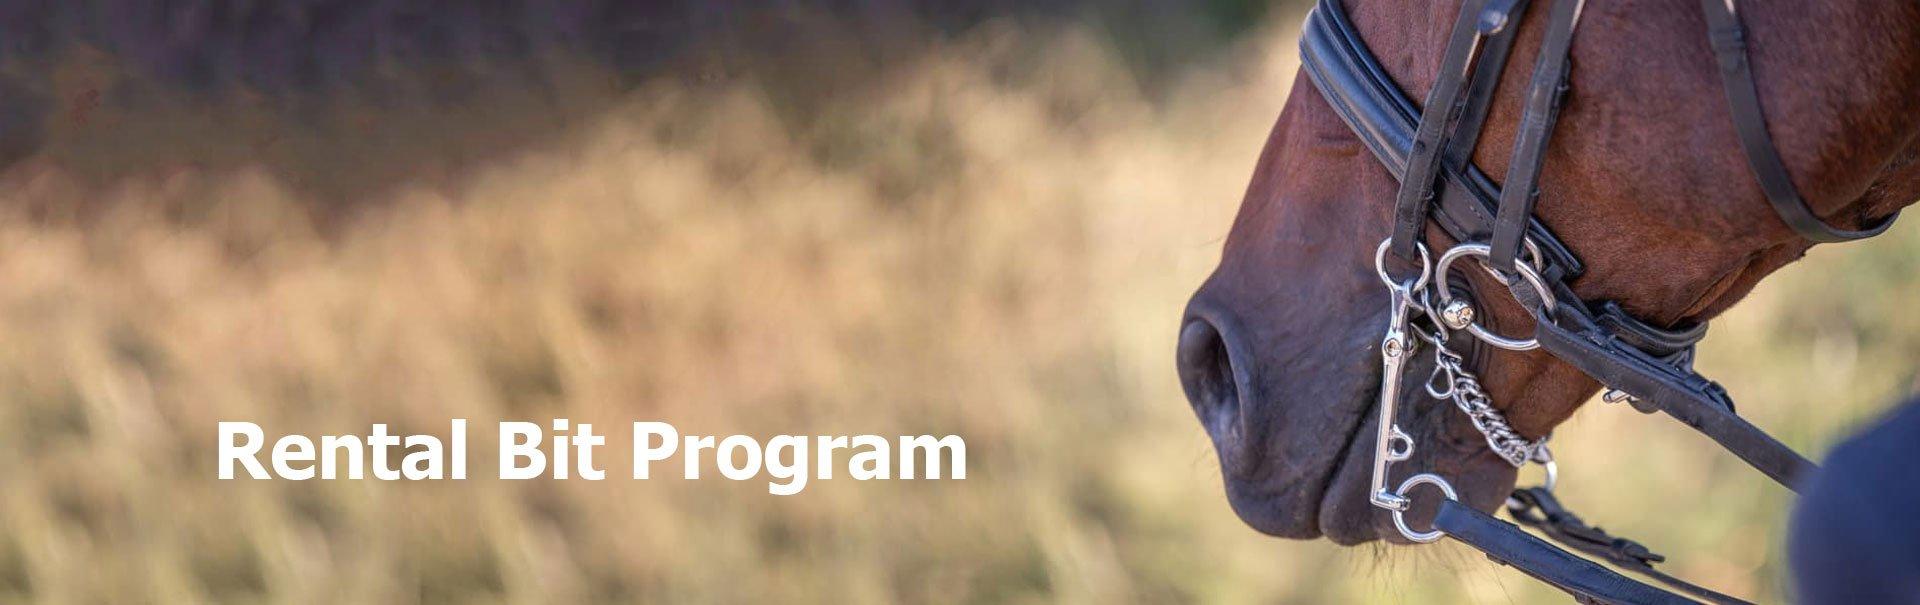 Rental Bit Program